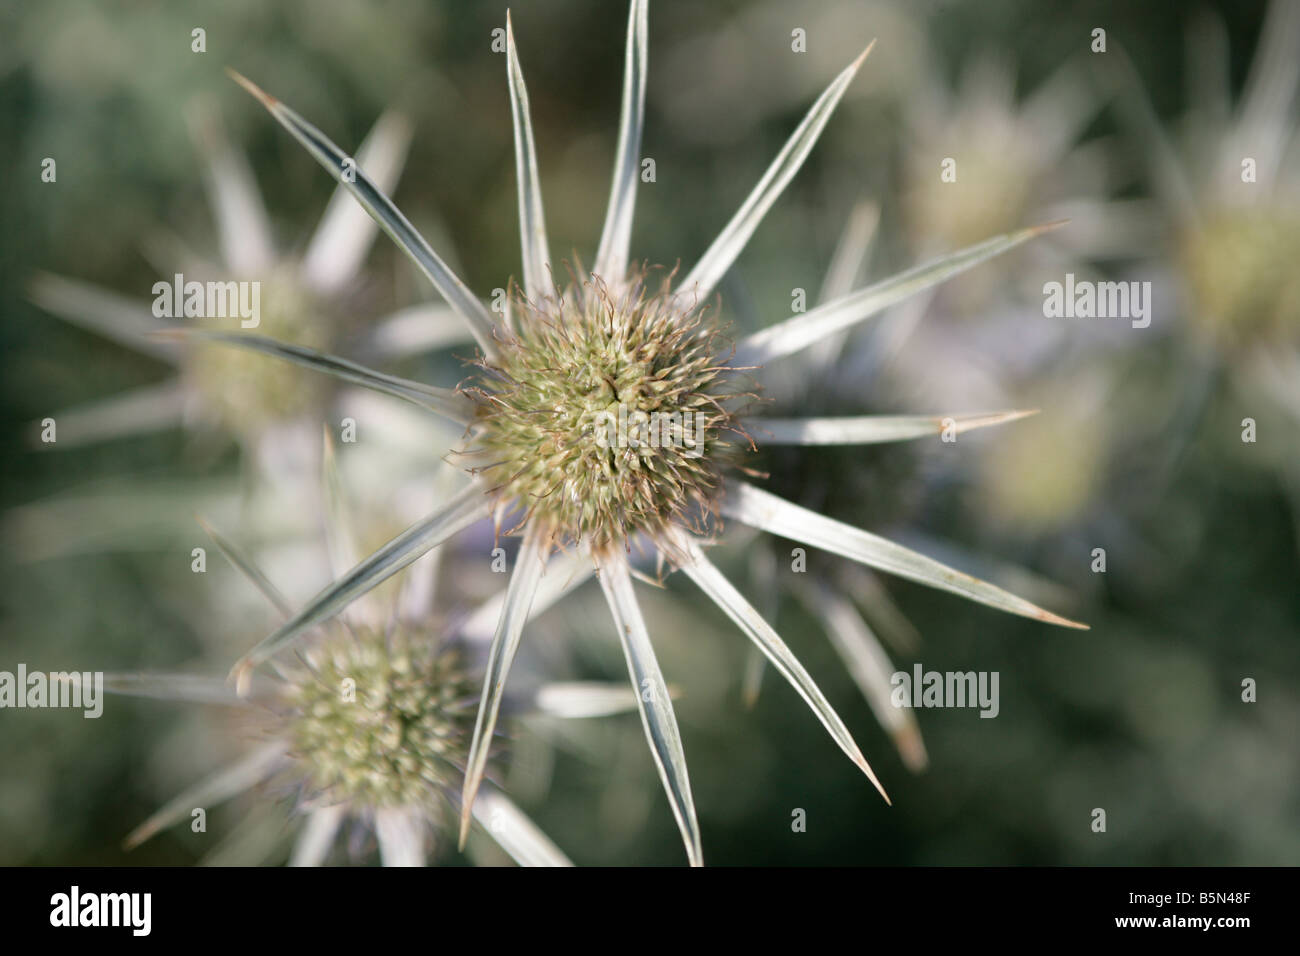 Eryngium thistles plant in bloom - Stock Image